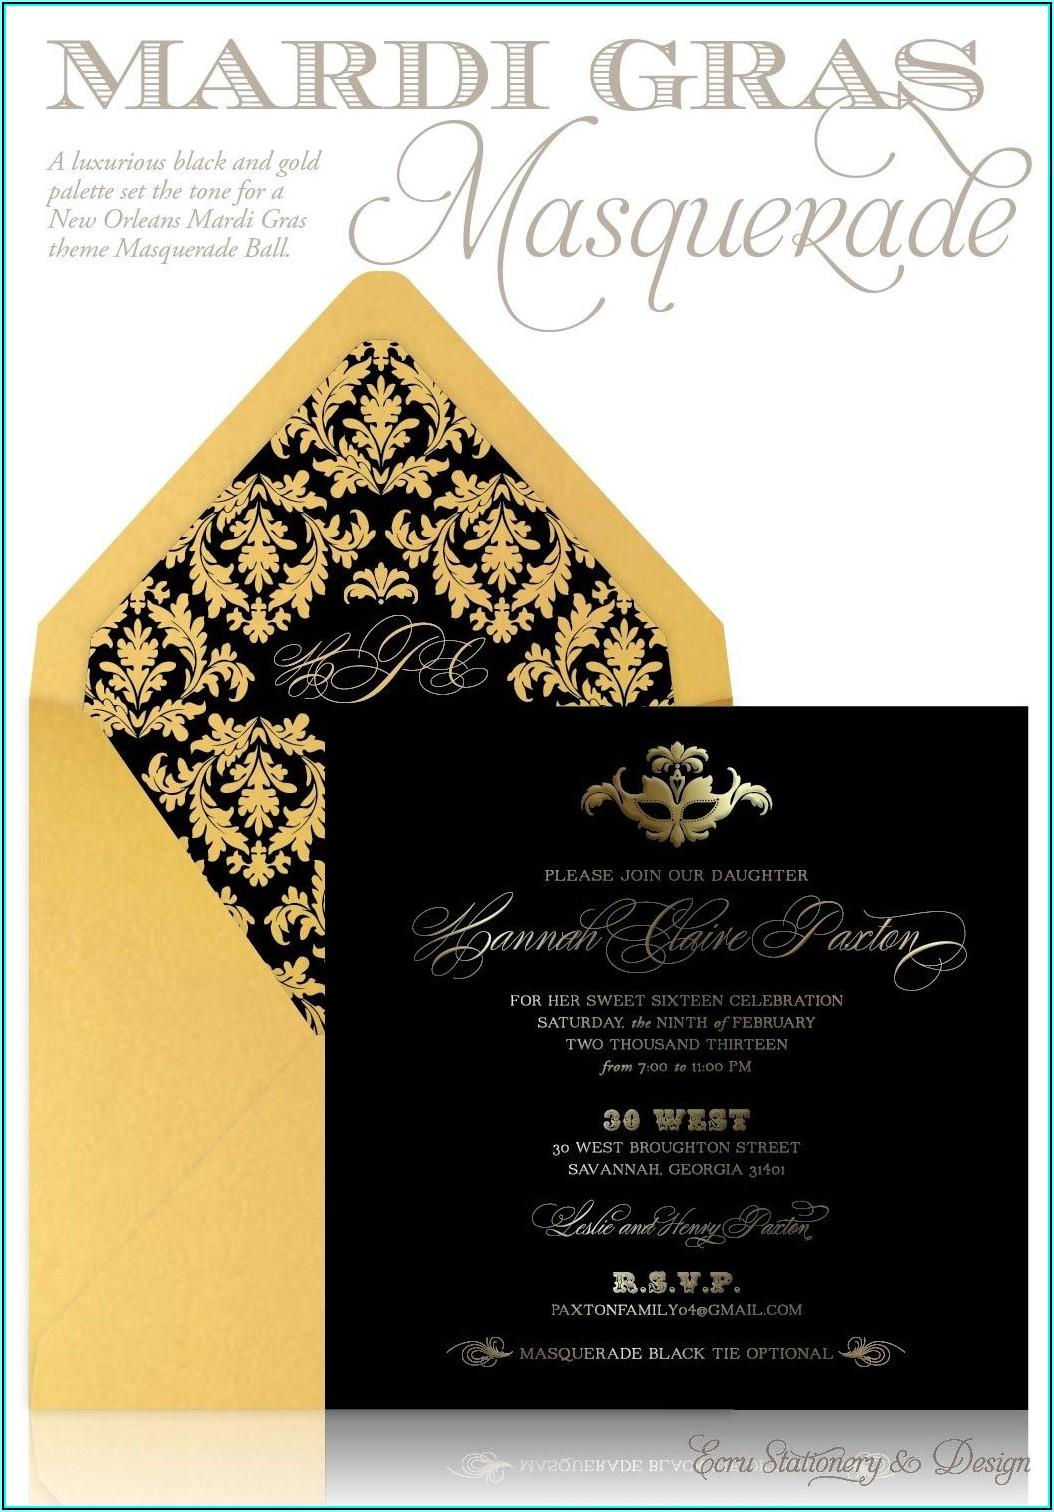 Masquerade Ball Invitations Free Templates